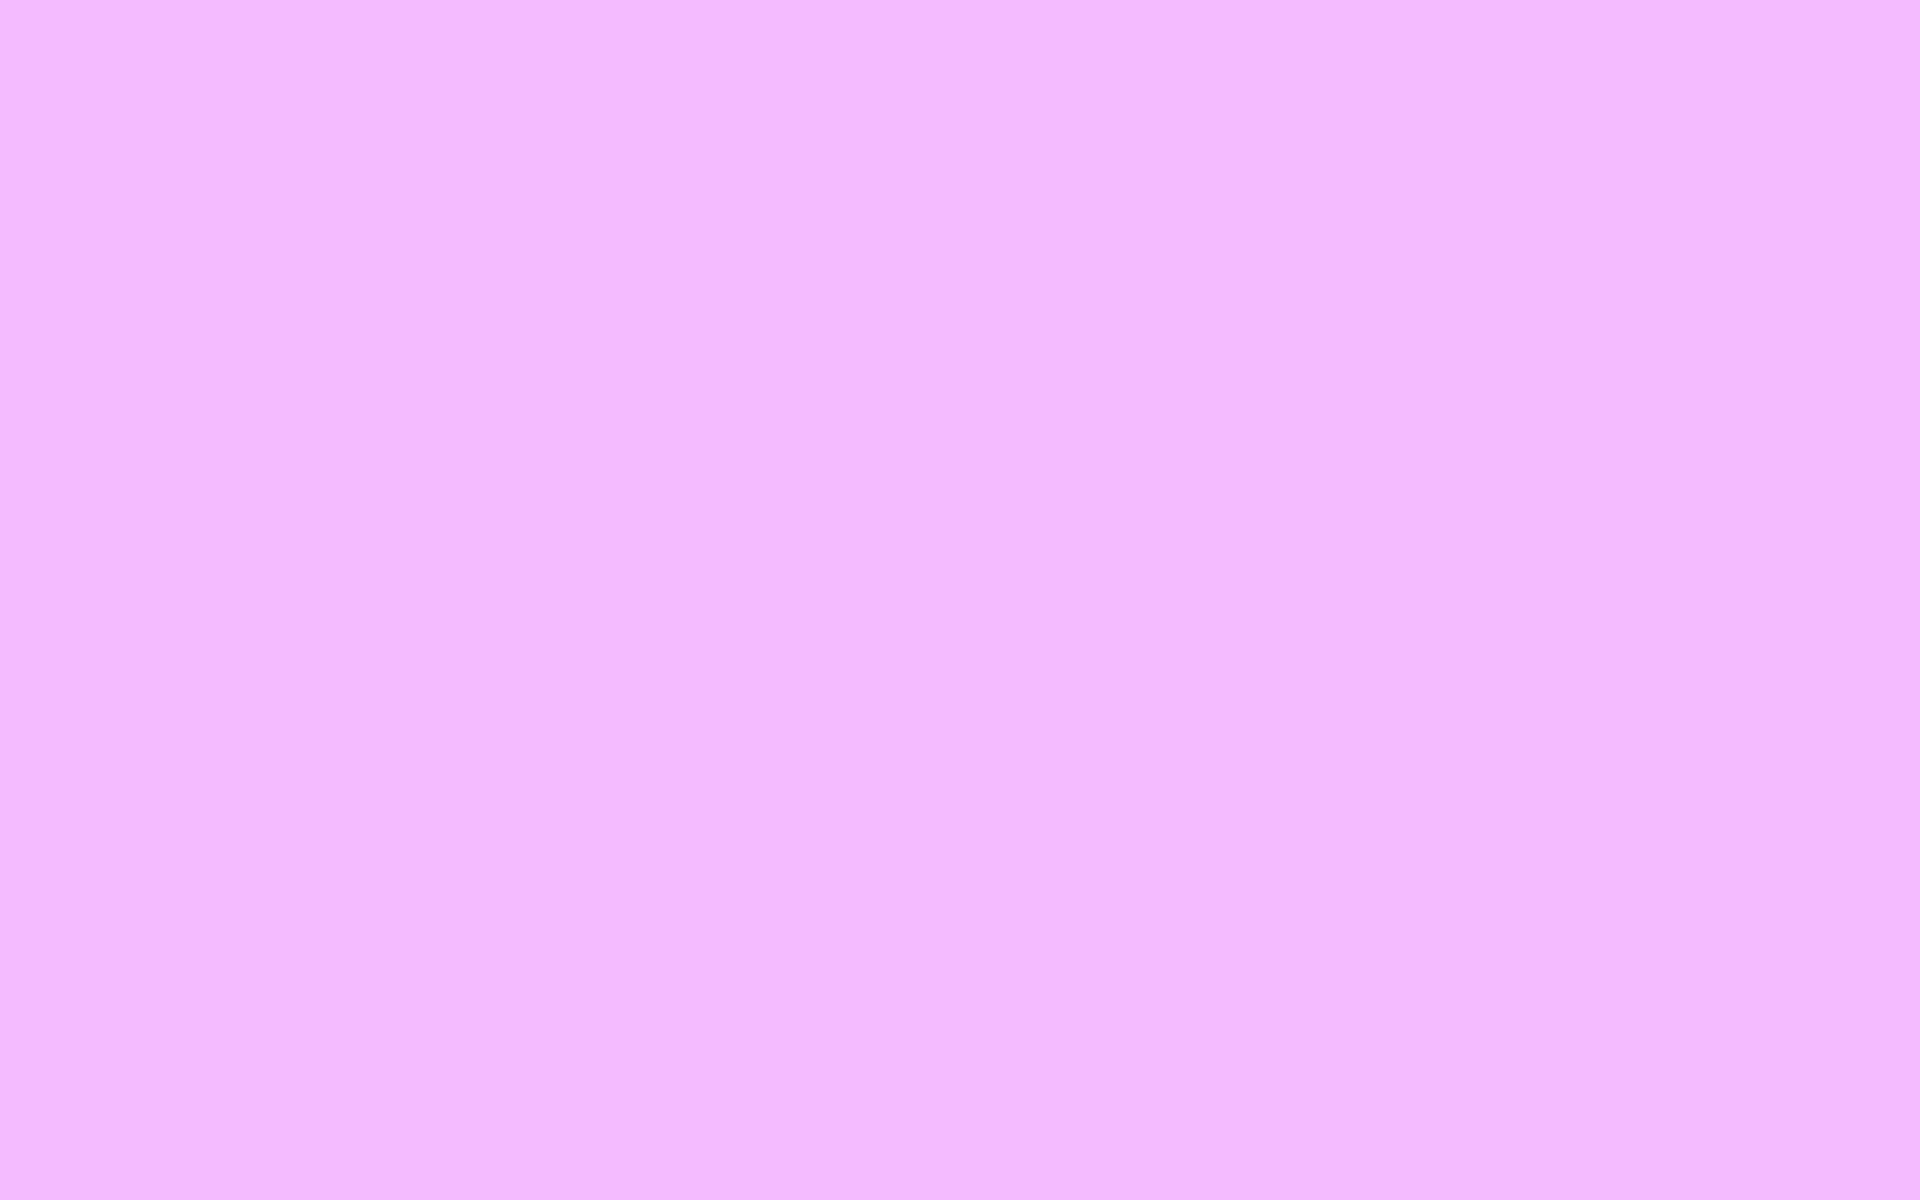 1920x1200 Brilliant Lavender Solid Color Background